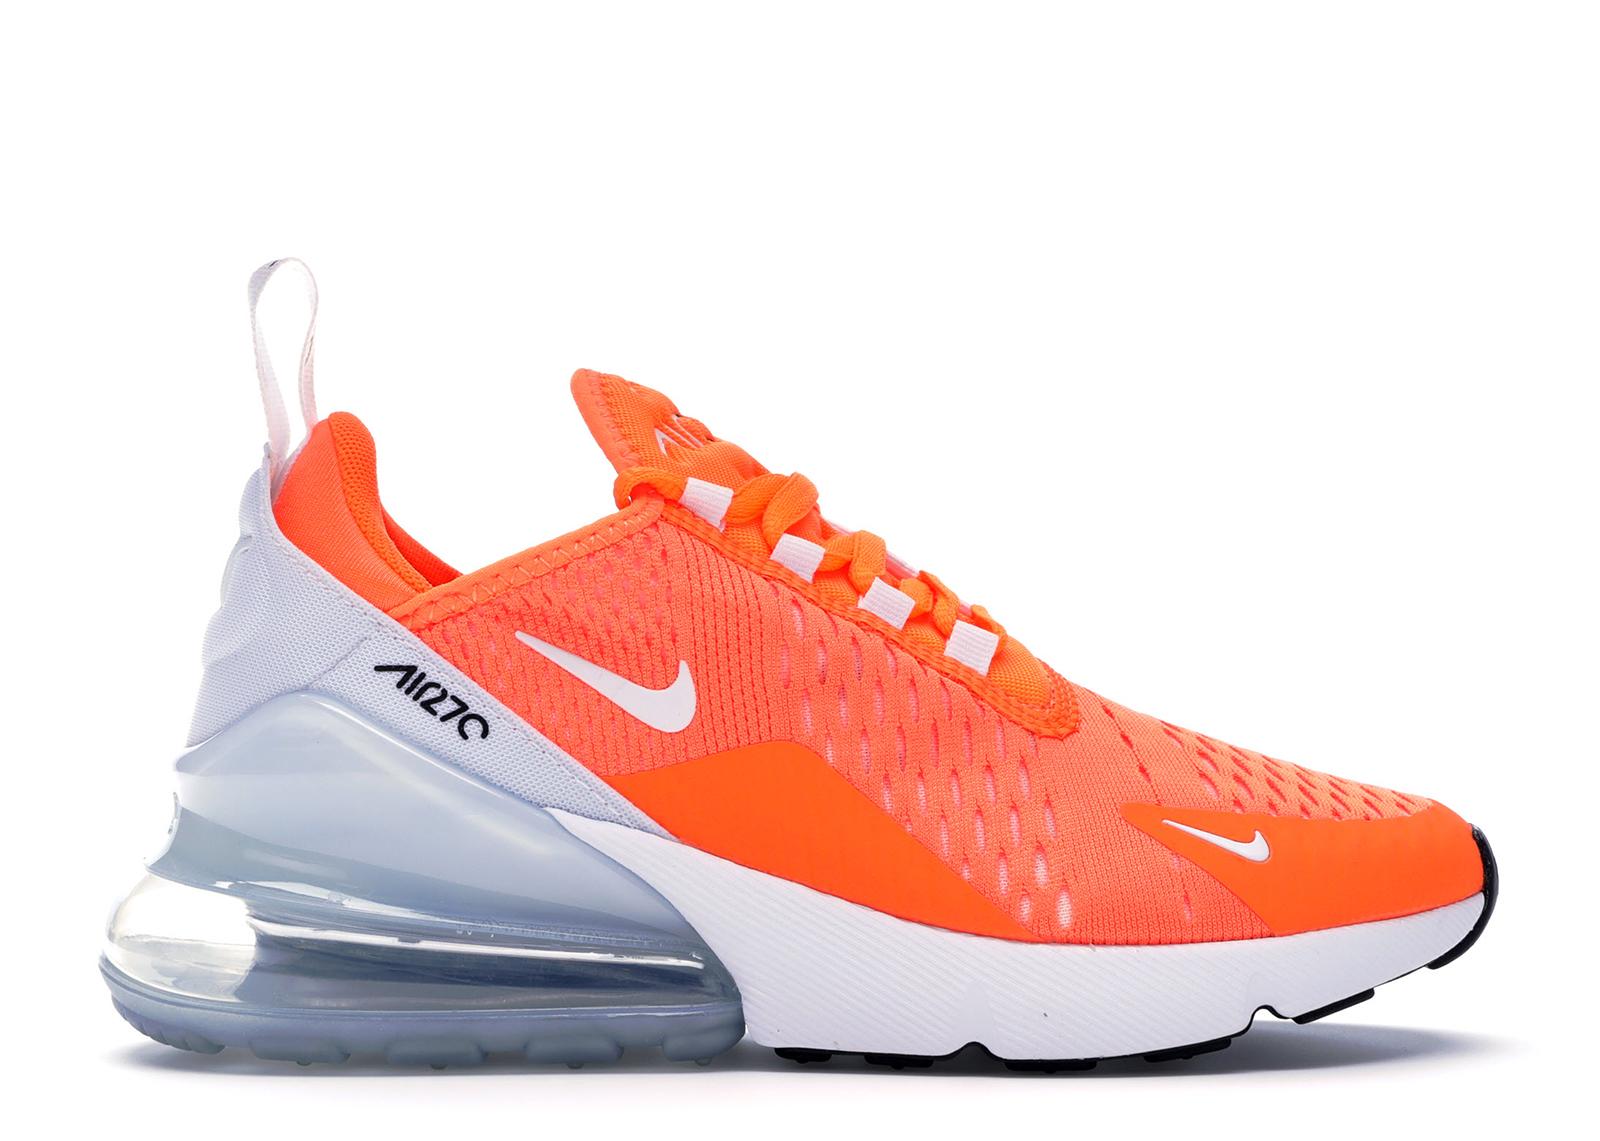 air max 270 blanche et orange